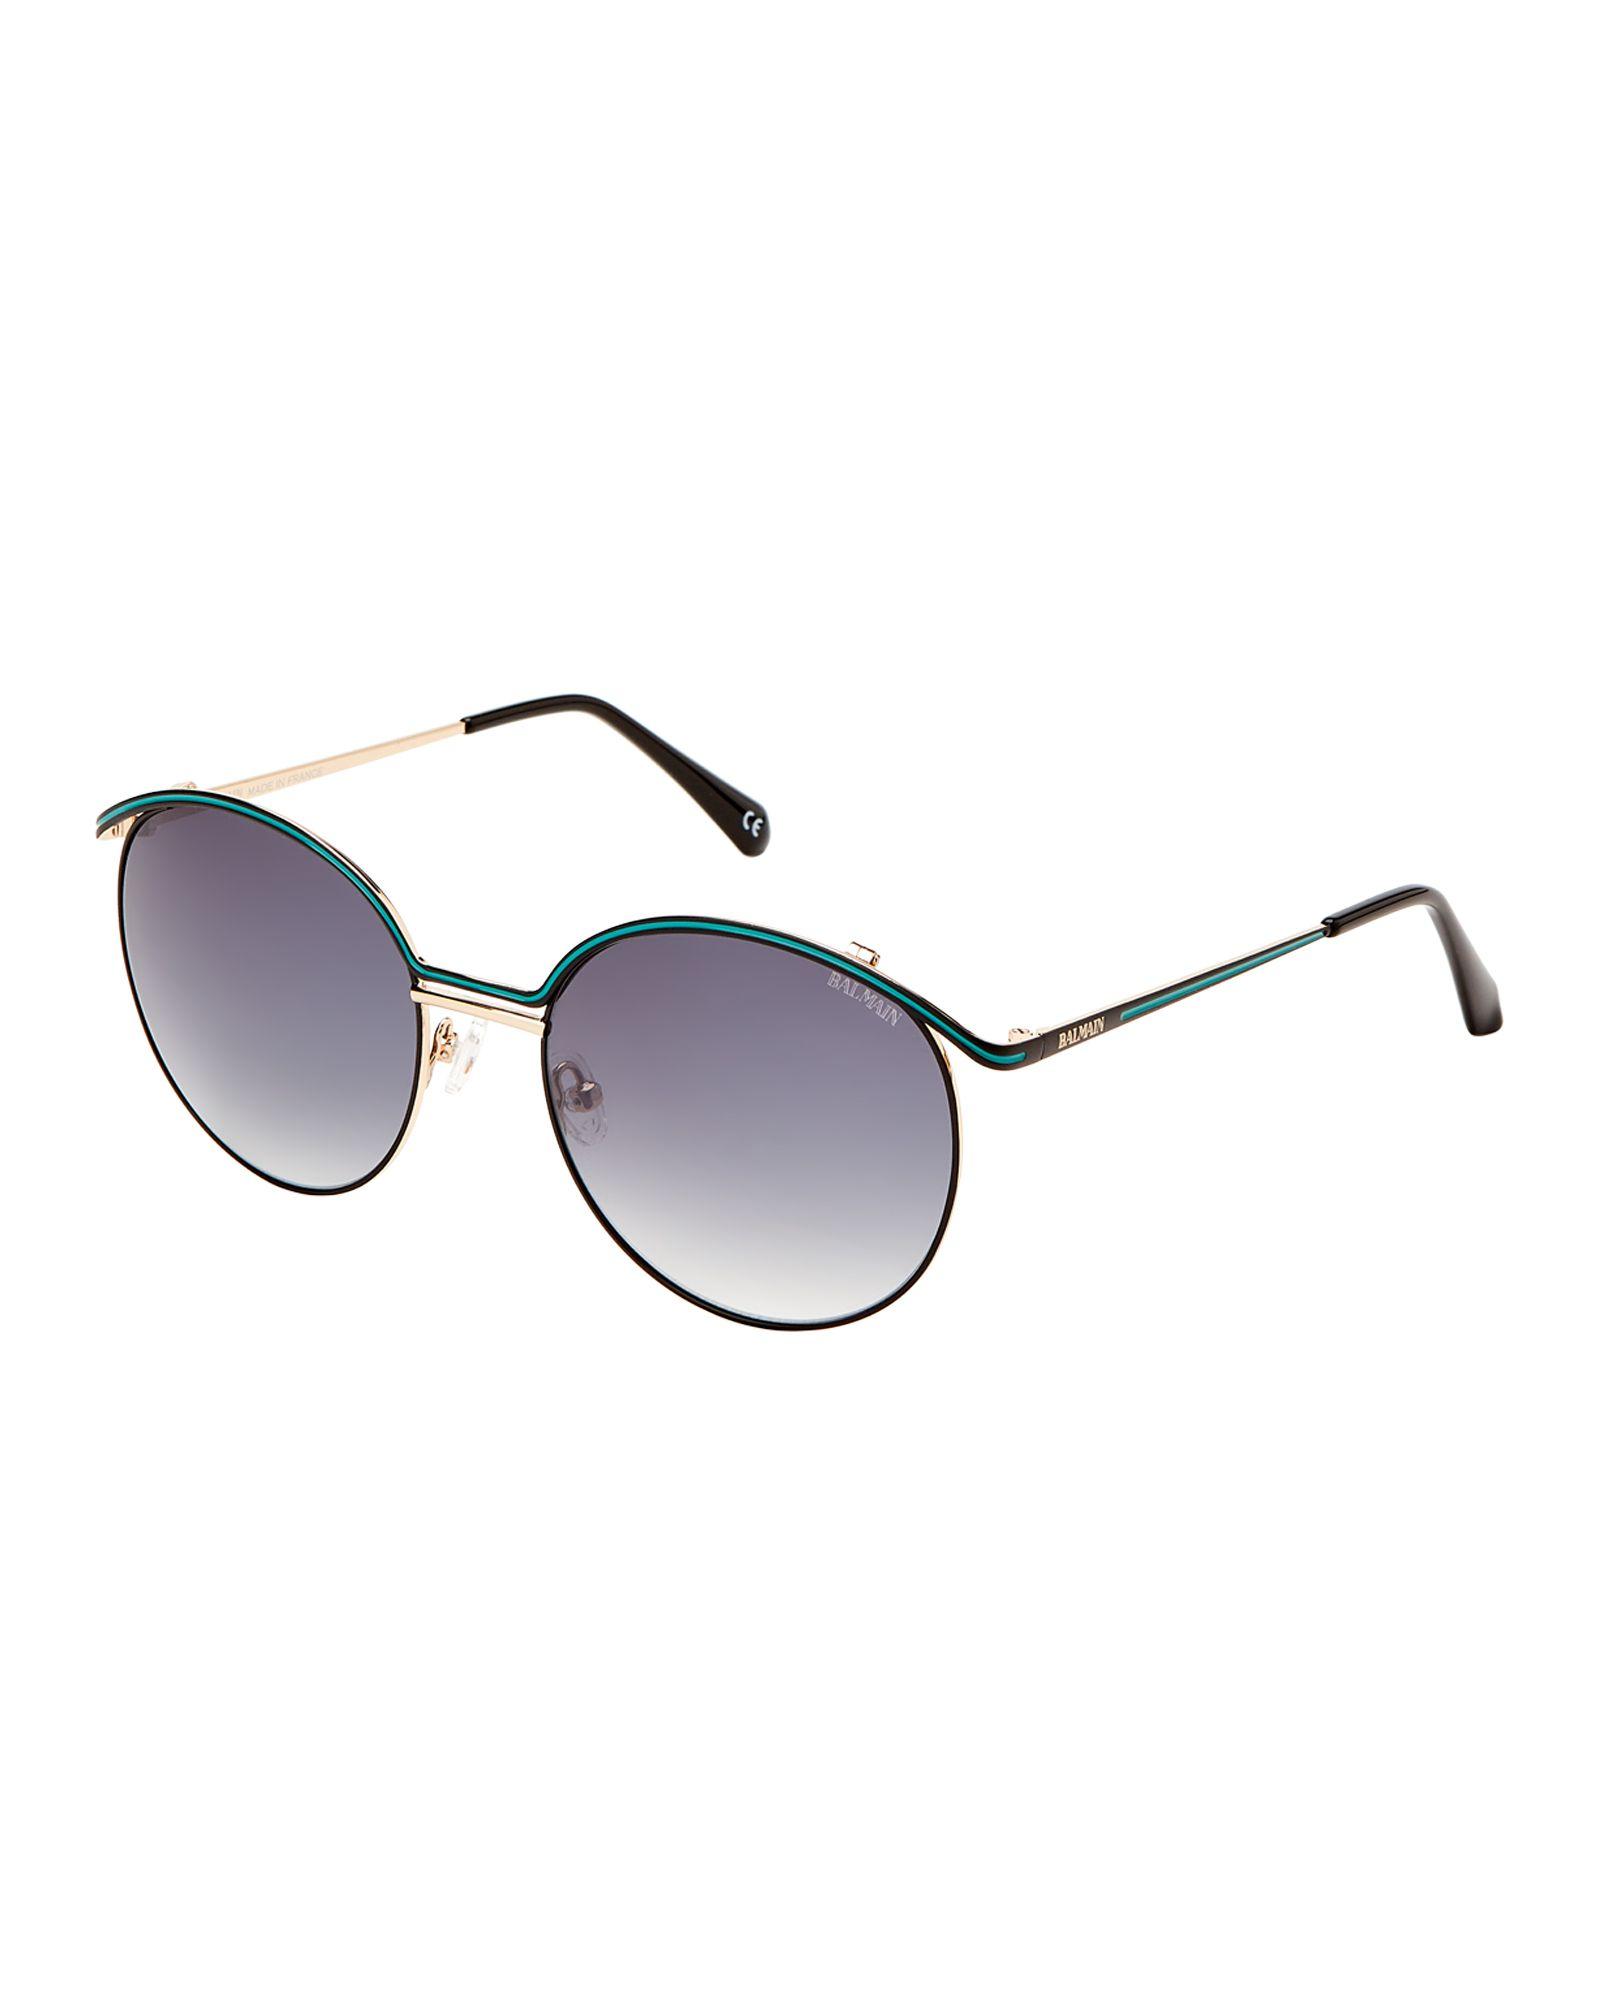 8200e3eaacf0b Balmain BL252902 Black   Green Round Sunglasses